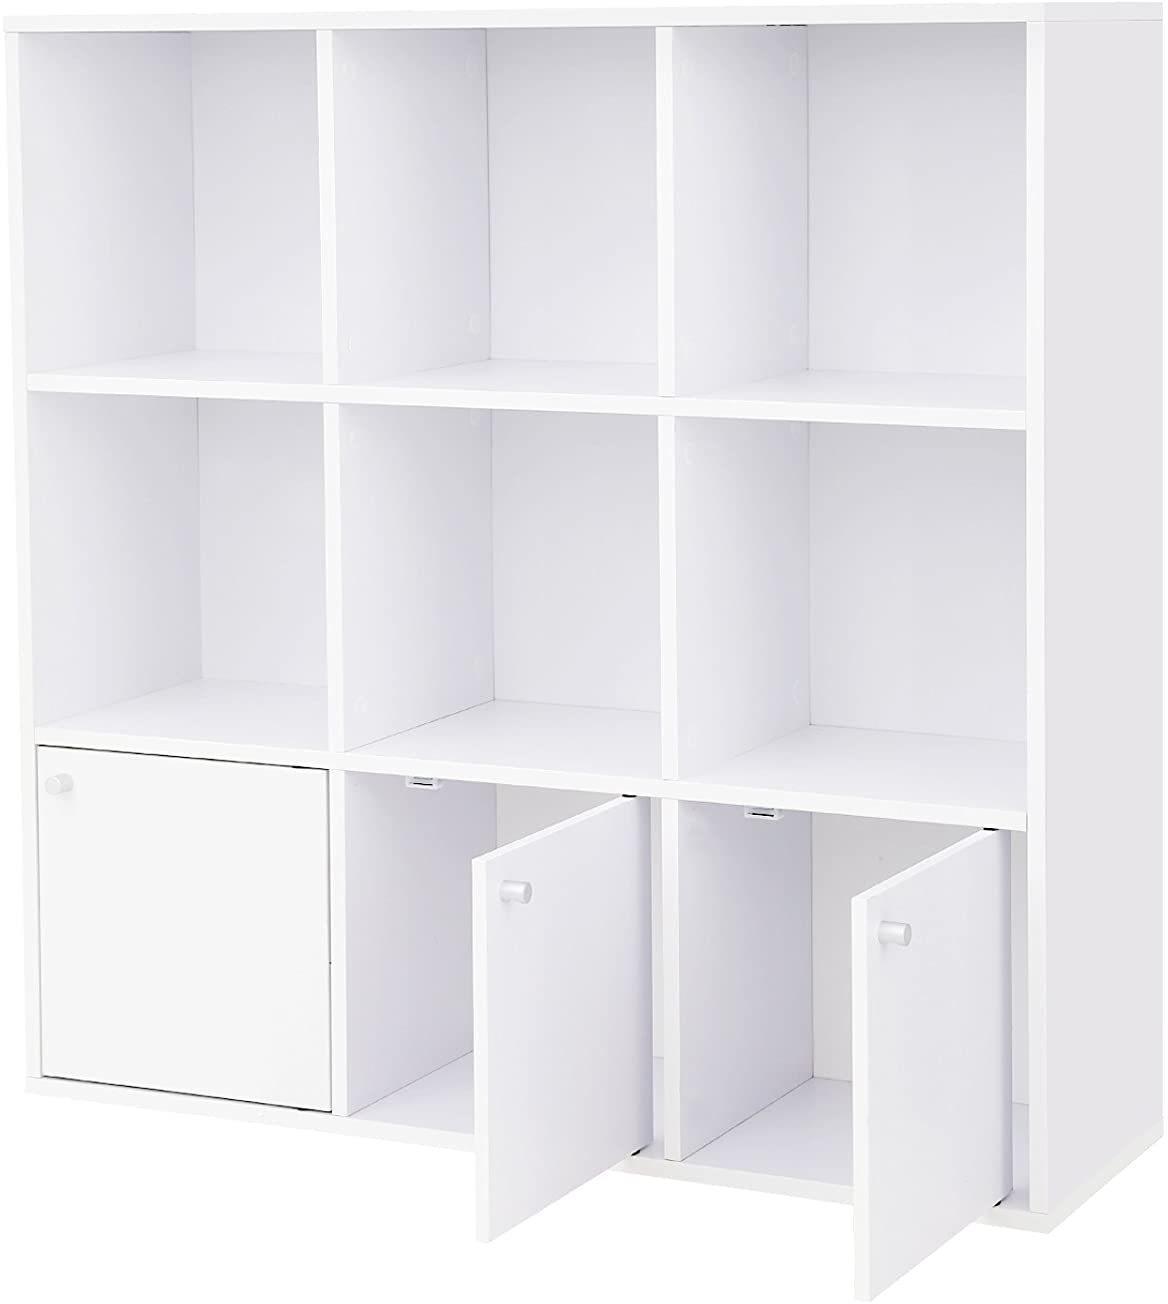 Knihovna VASAGLE Wooda bílá